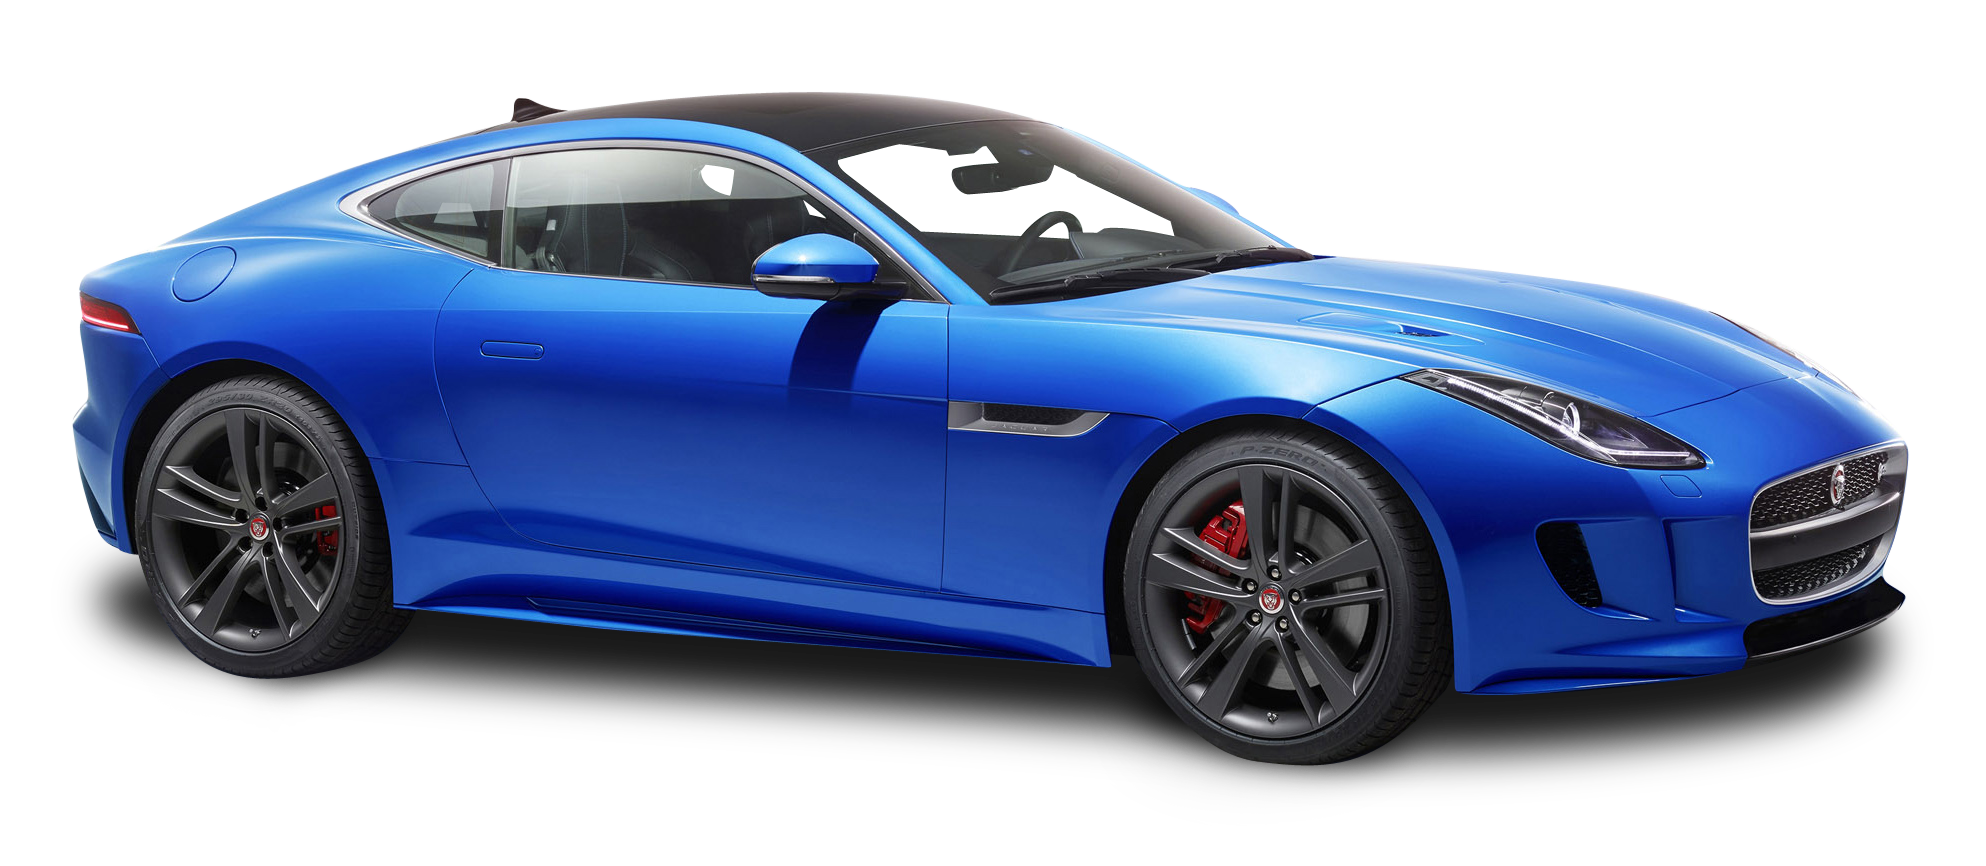 Jaguar F Type Luxury Sports Blue Car Png Image Purepng Free